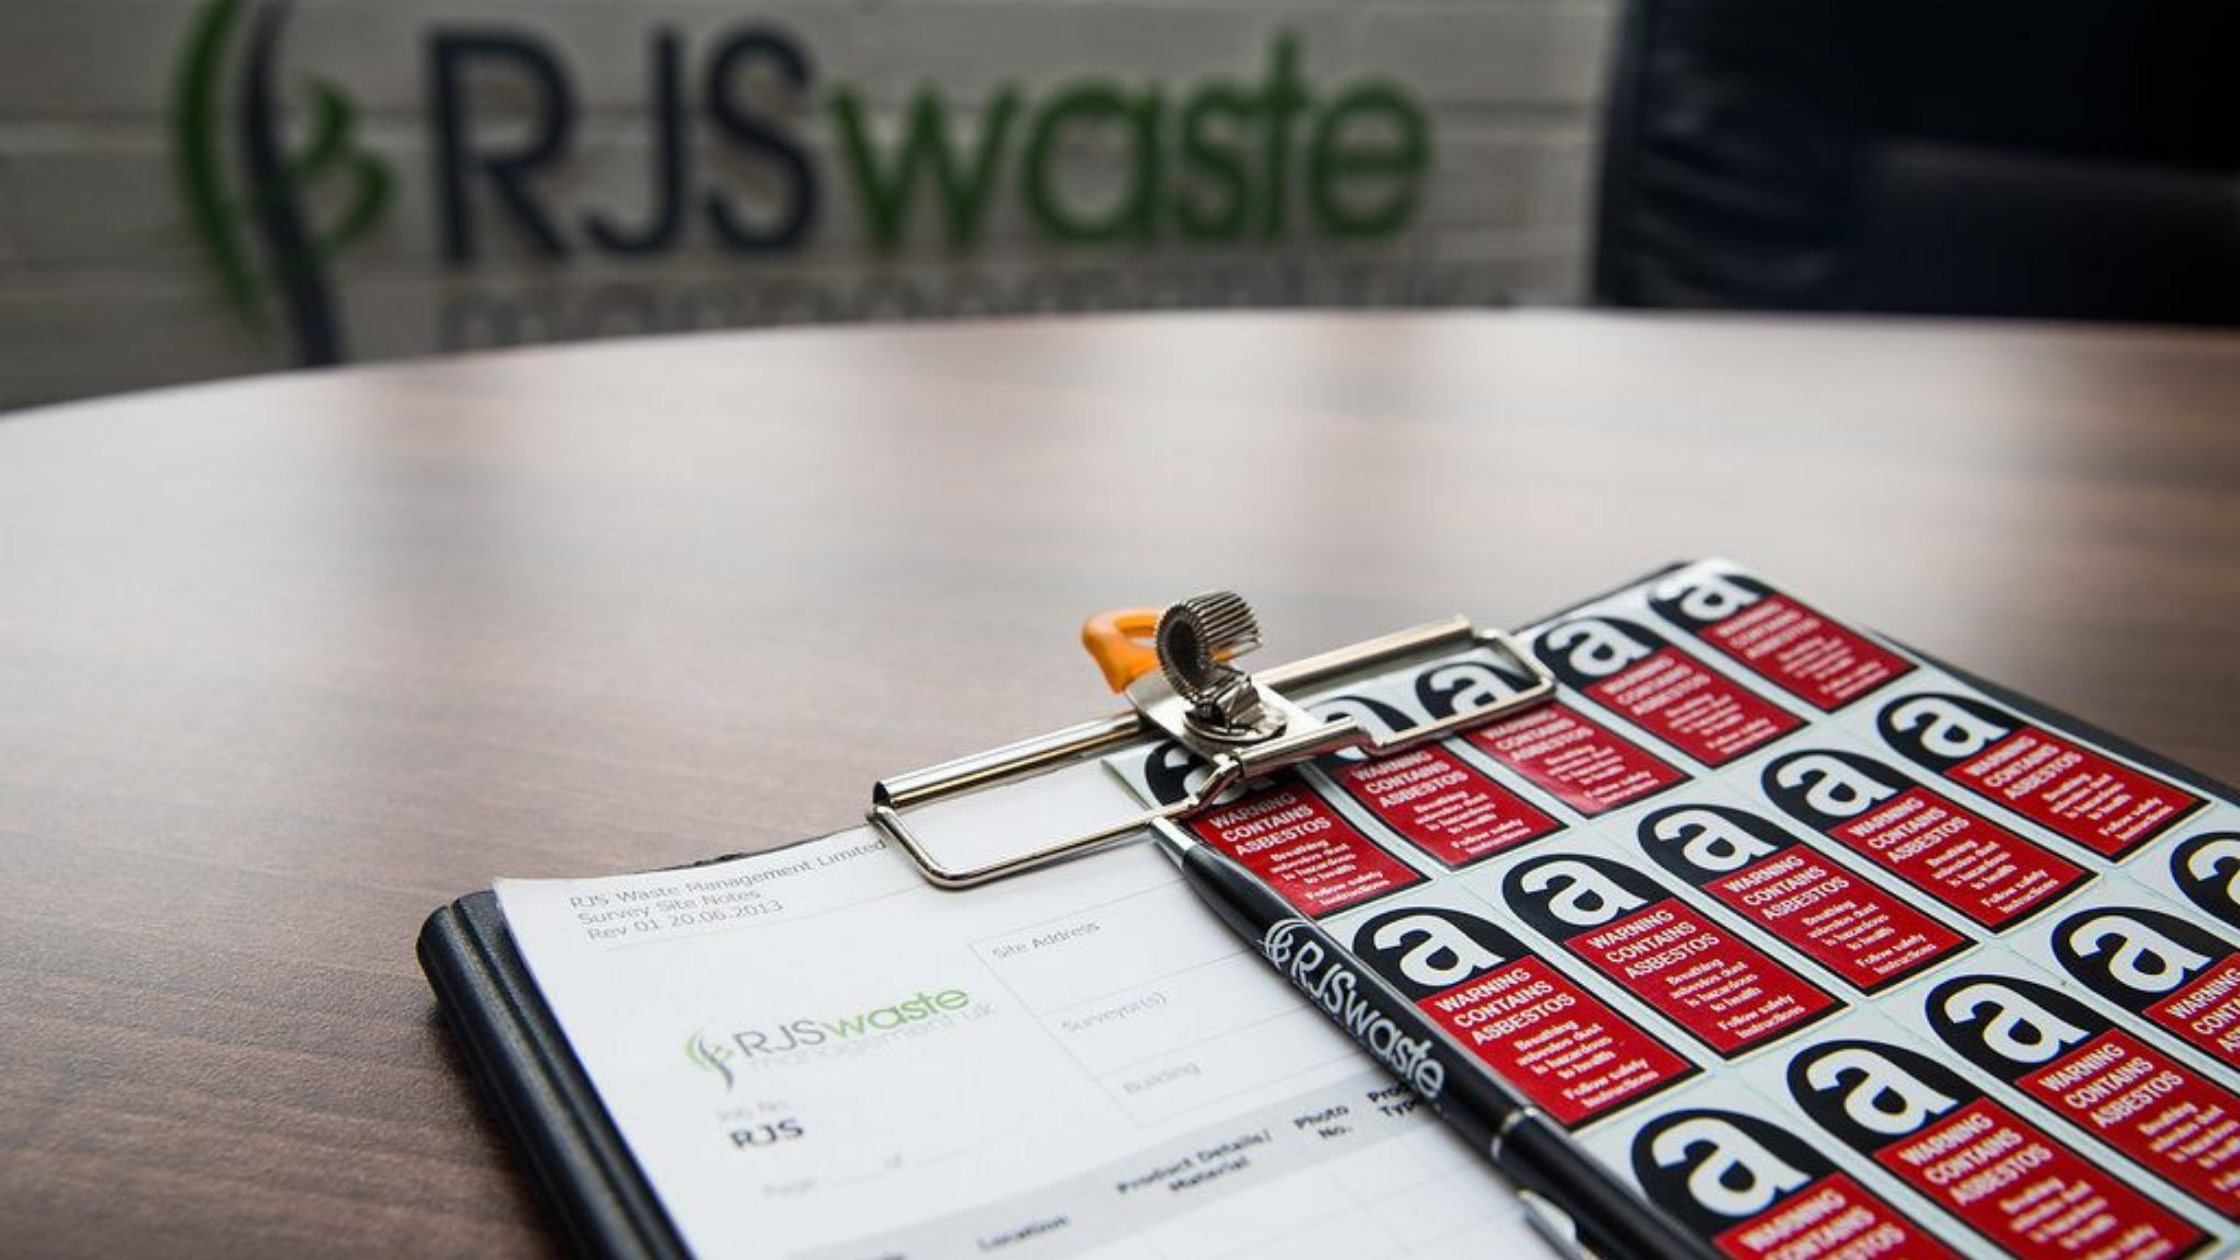 RJS Waste Management documents for Oxford asbestos surveys